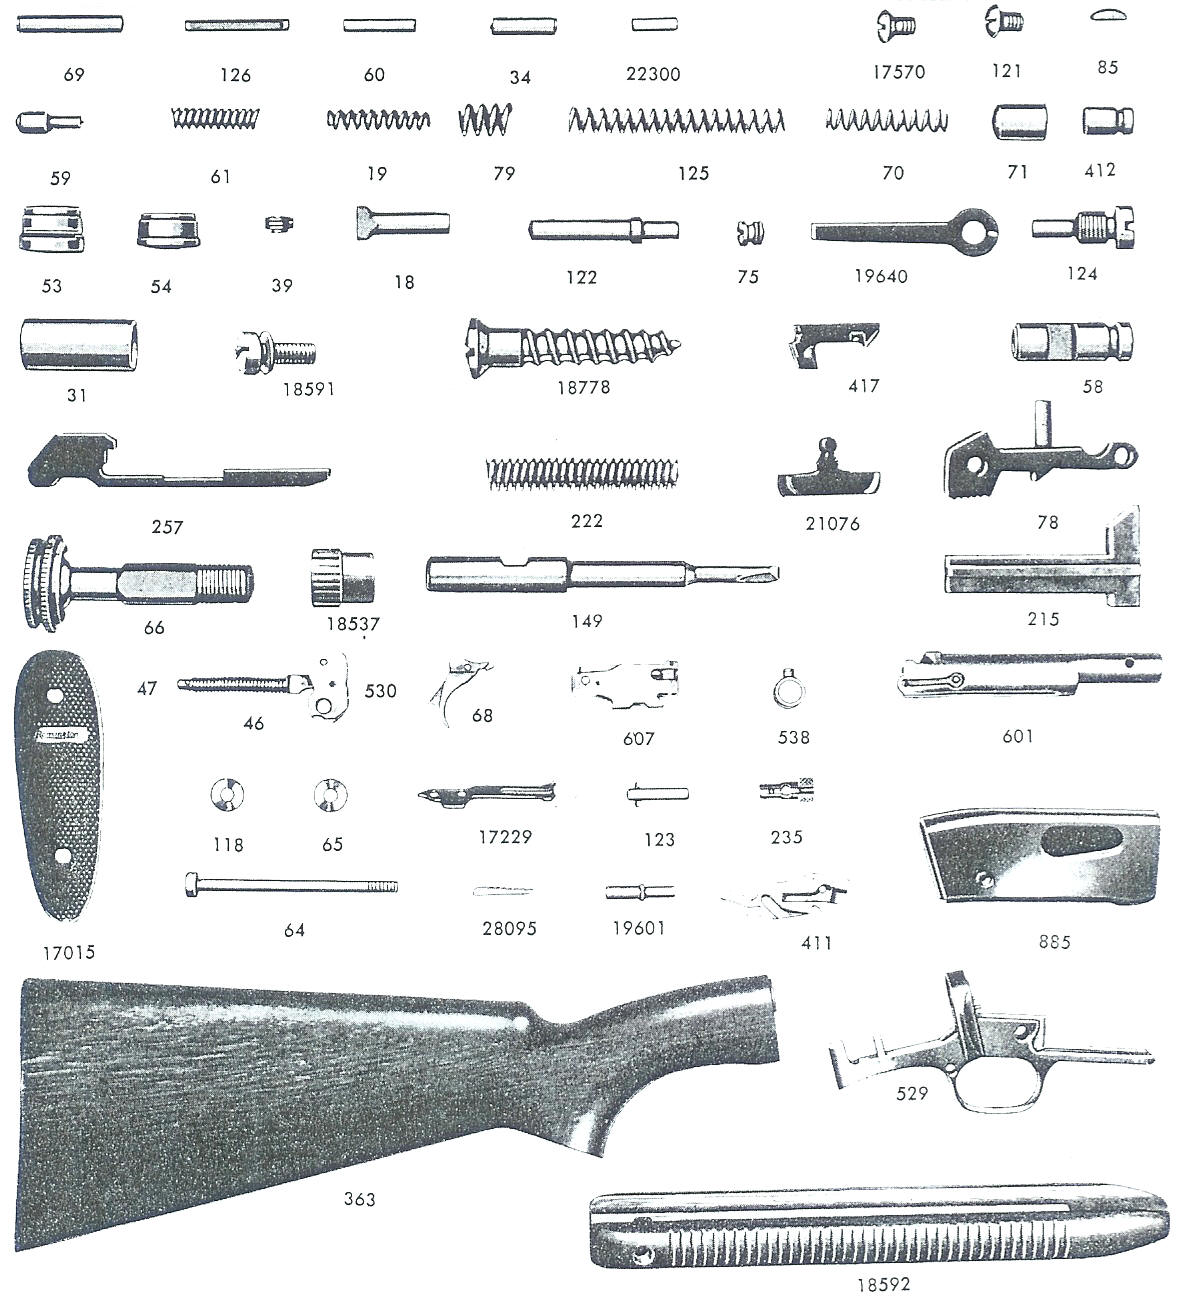 Remington Model 121 Actual Load